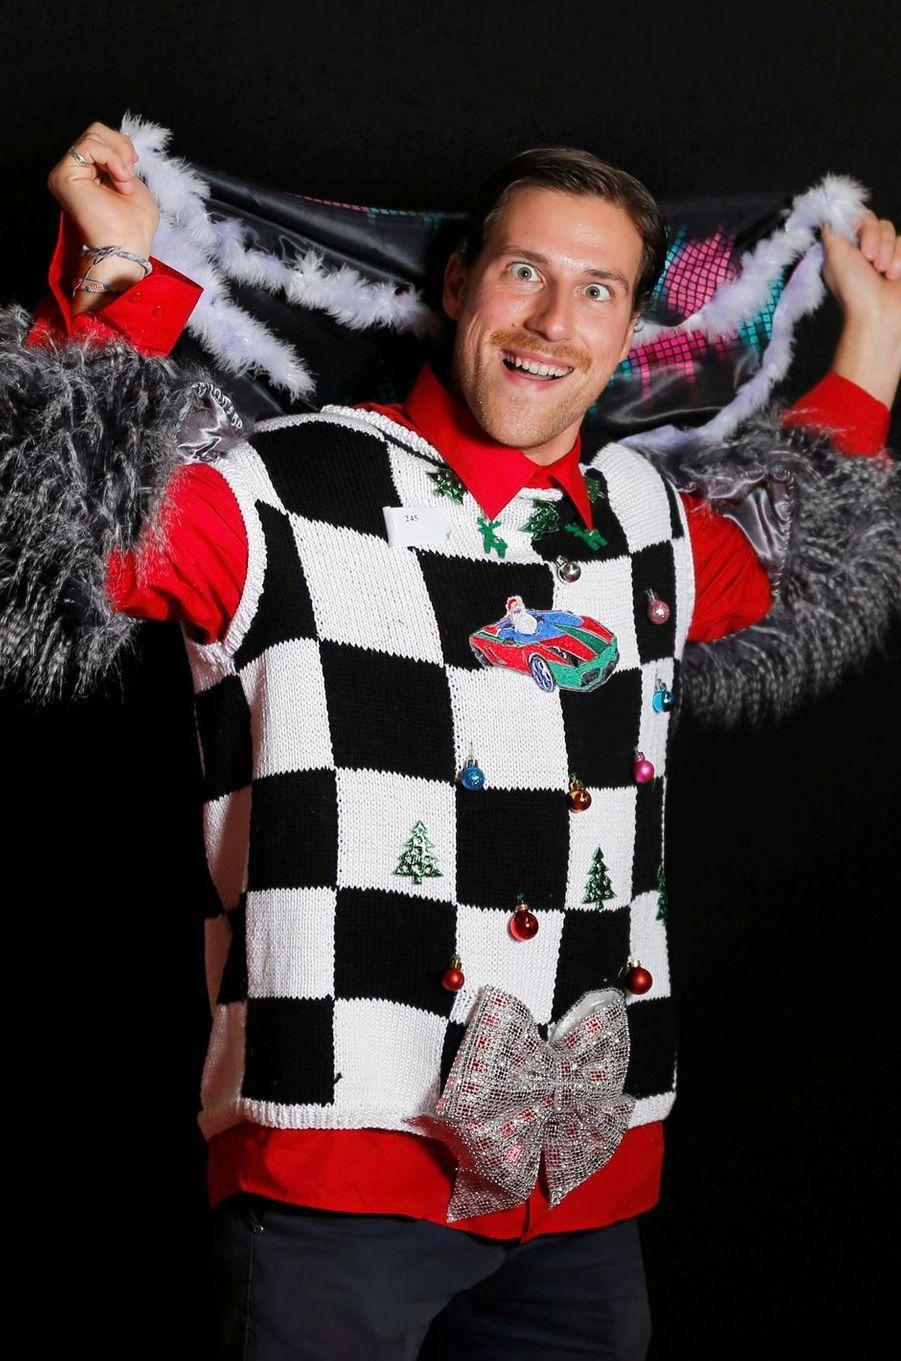 Le championnat du monde de pull moche a eu lieu à Albi, le 25 novembre 2017.